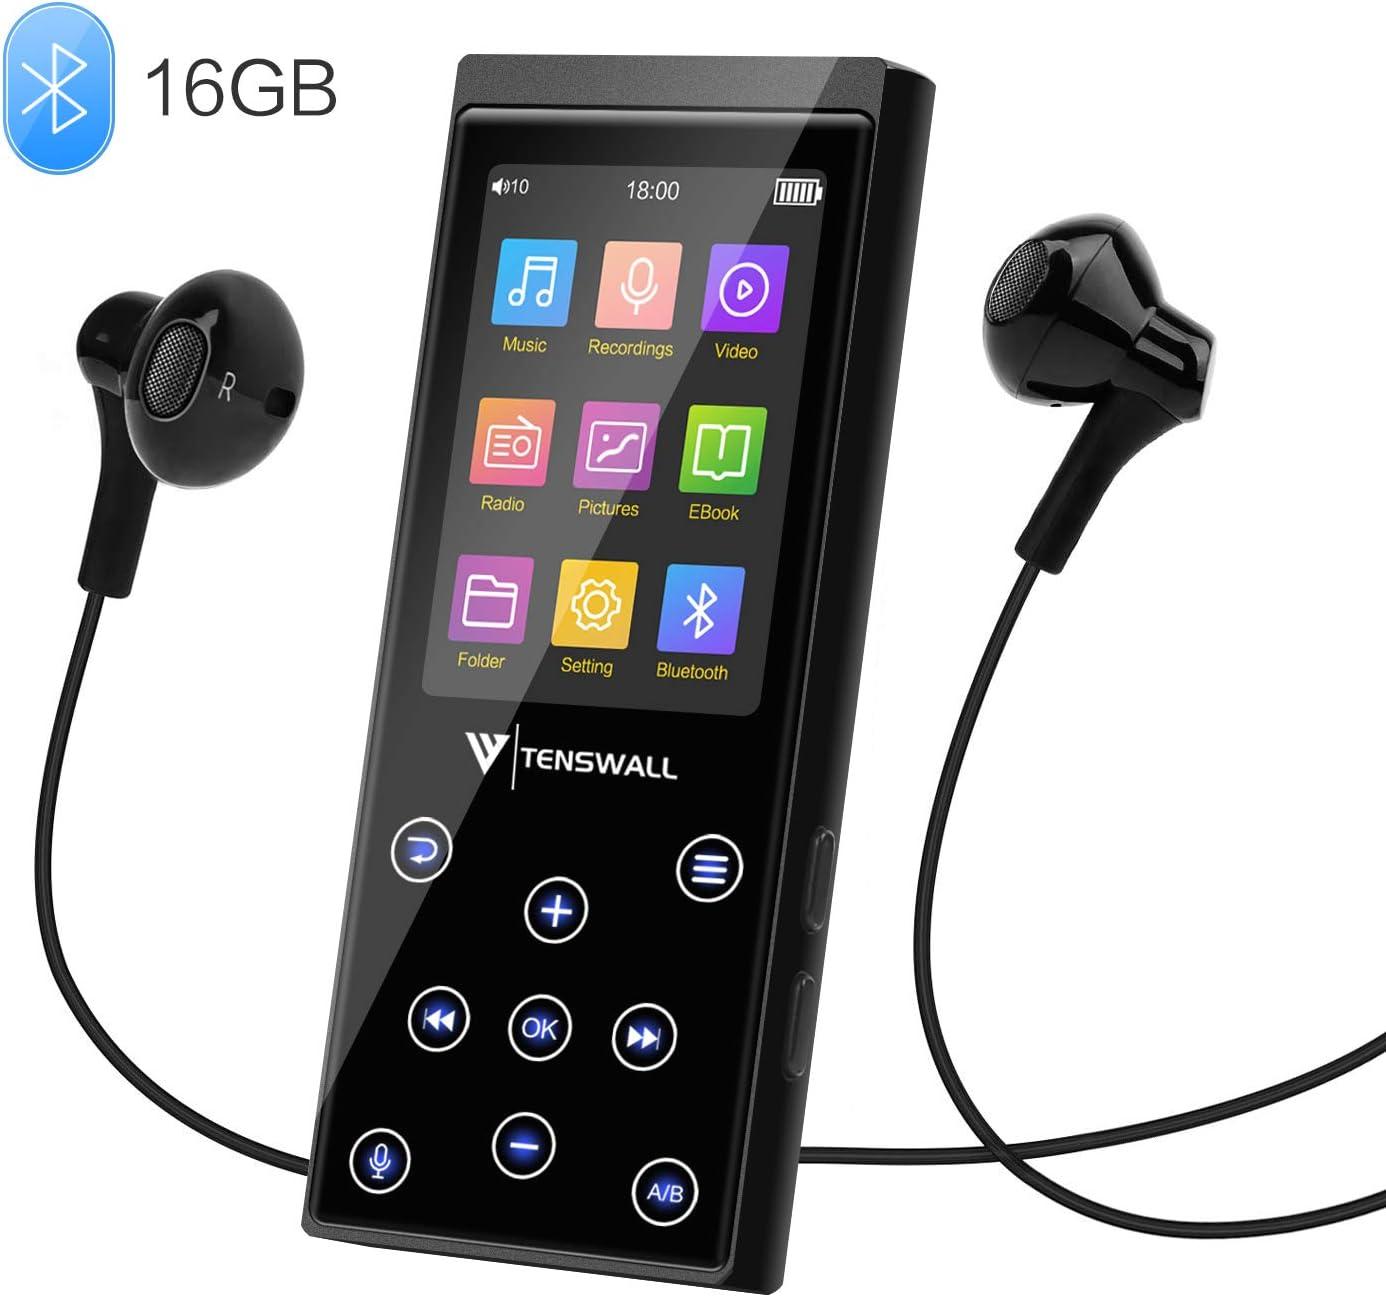 Tenswall MP3 Player, 16GB MP3 with FM Radio Voice Recorder E-Book 2.4'' Screen